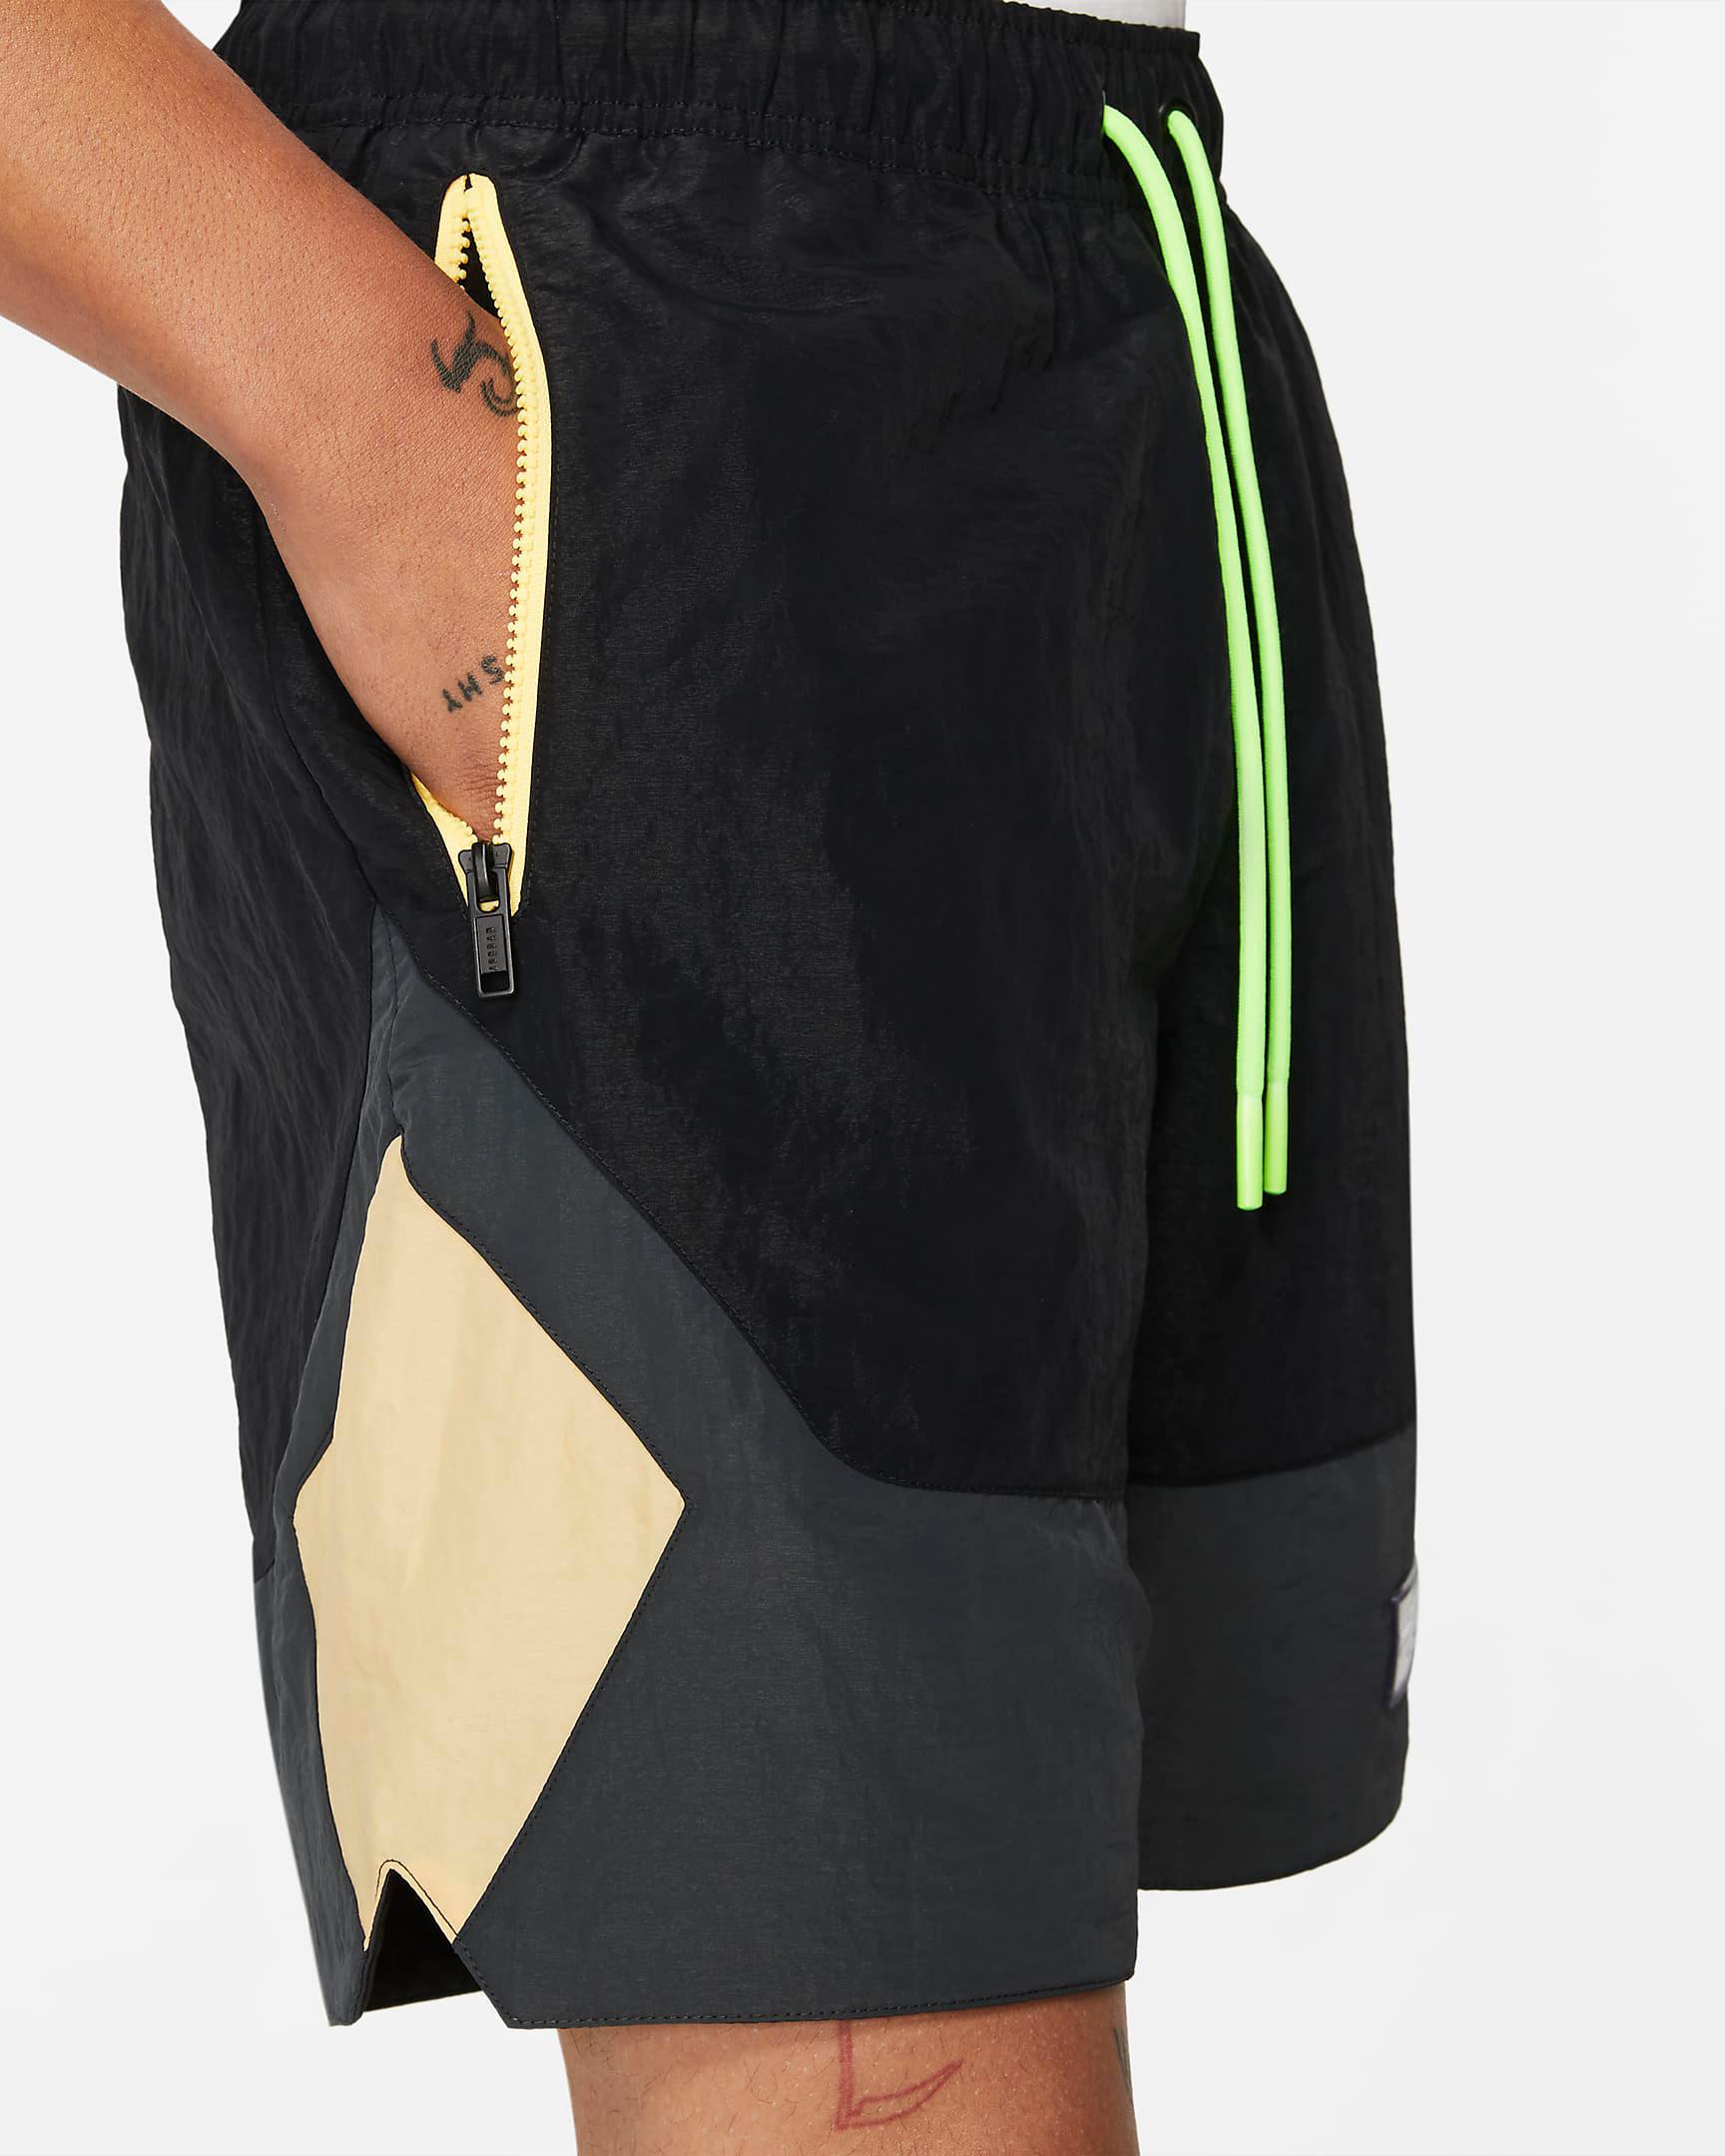 jordan-23-engineered-diamond-shorts-black-electric-green